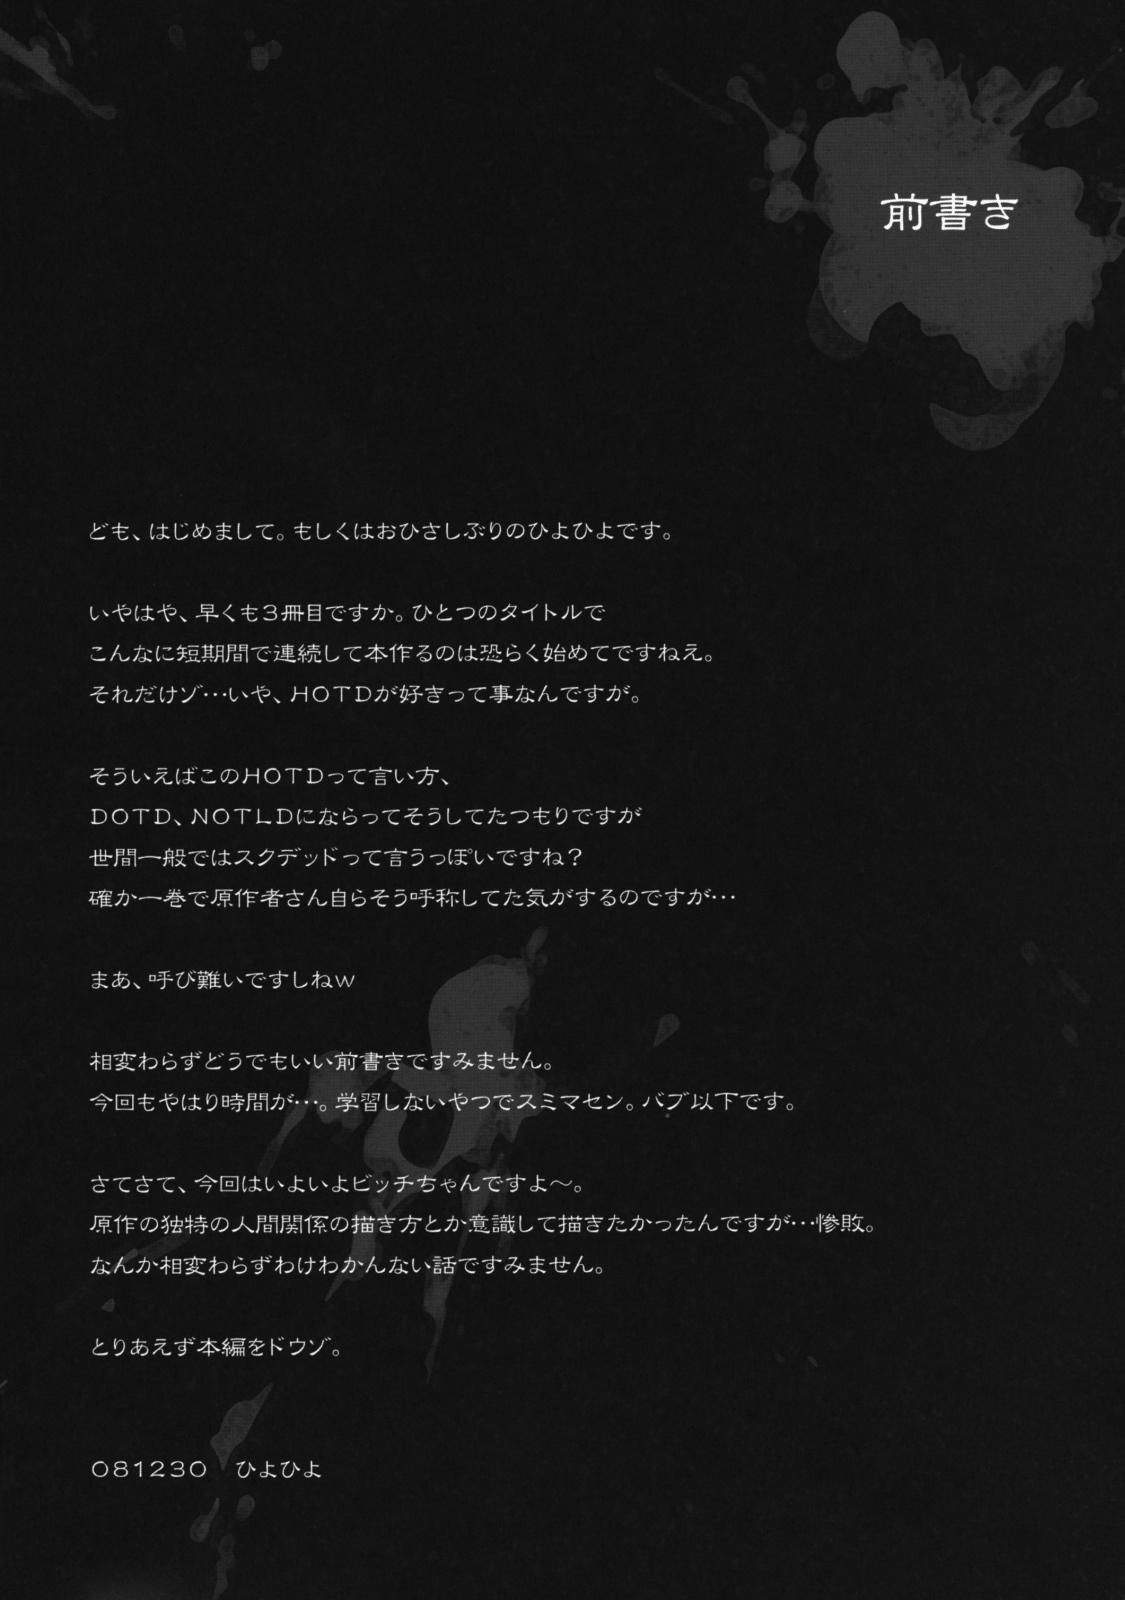 (C75) [Kashiwa-ya (Hiyo Hiyo)] D[O]HOTD3 D.A.T. (HIGHSCHOOL OF THE DEAD) [English] =LWB= 3